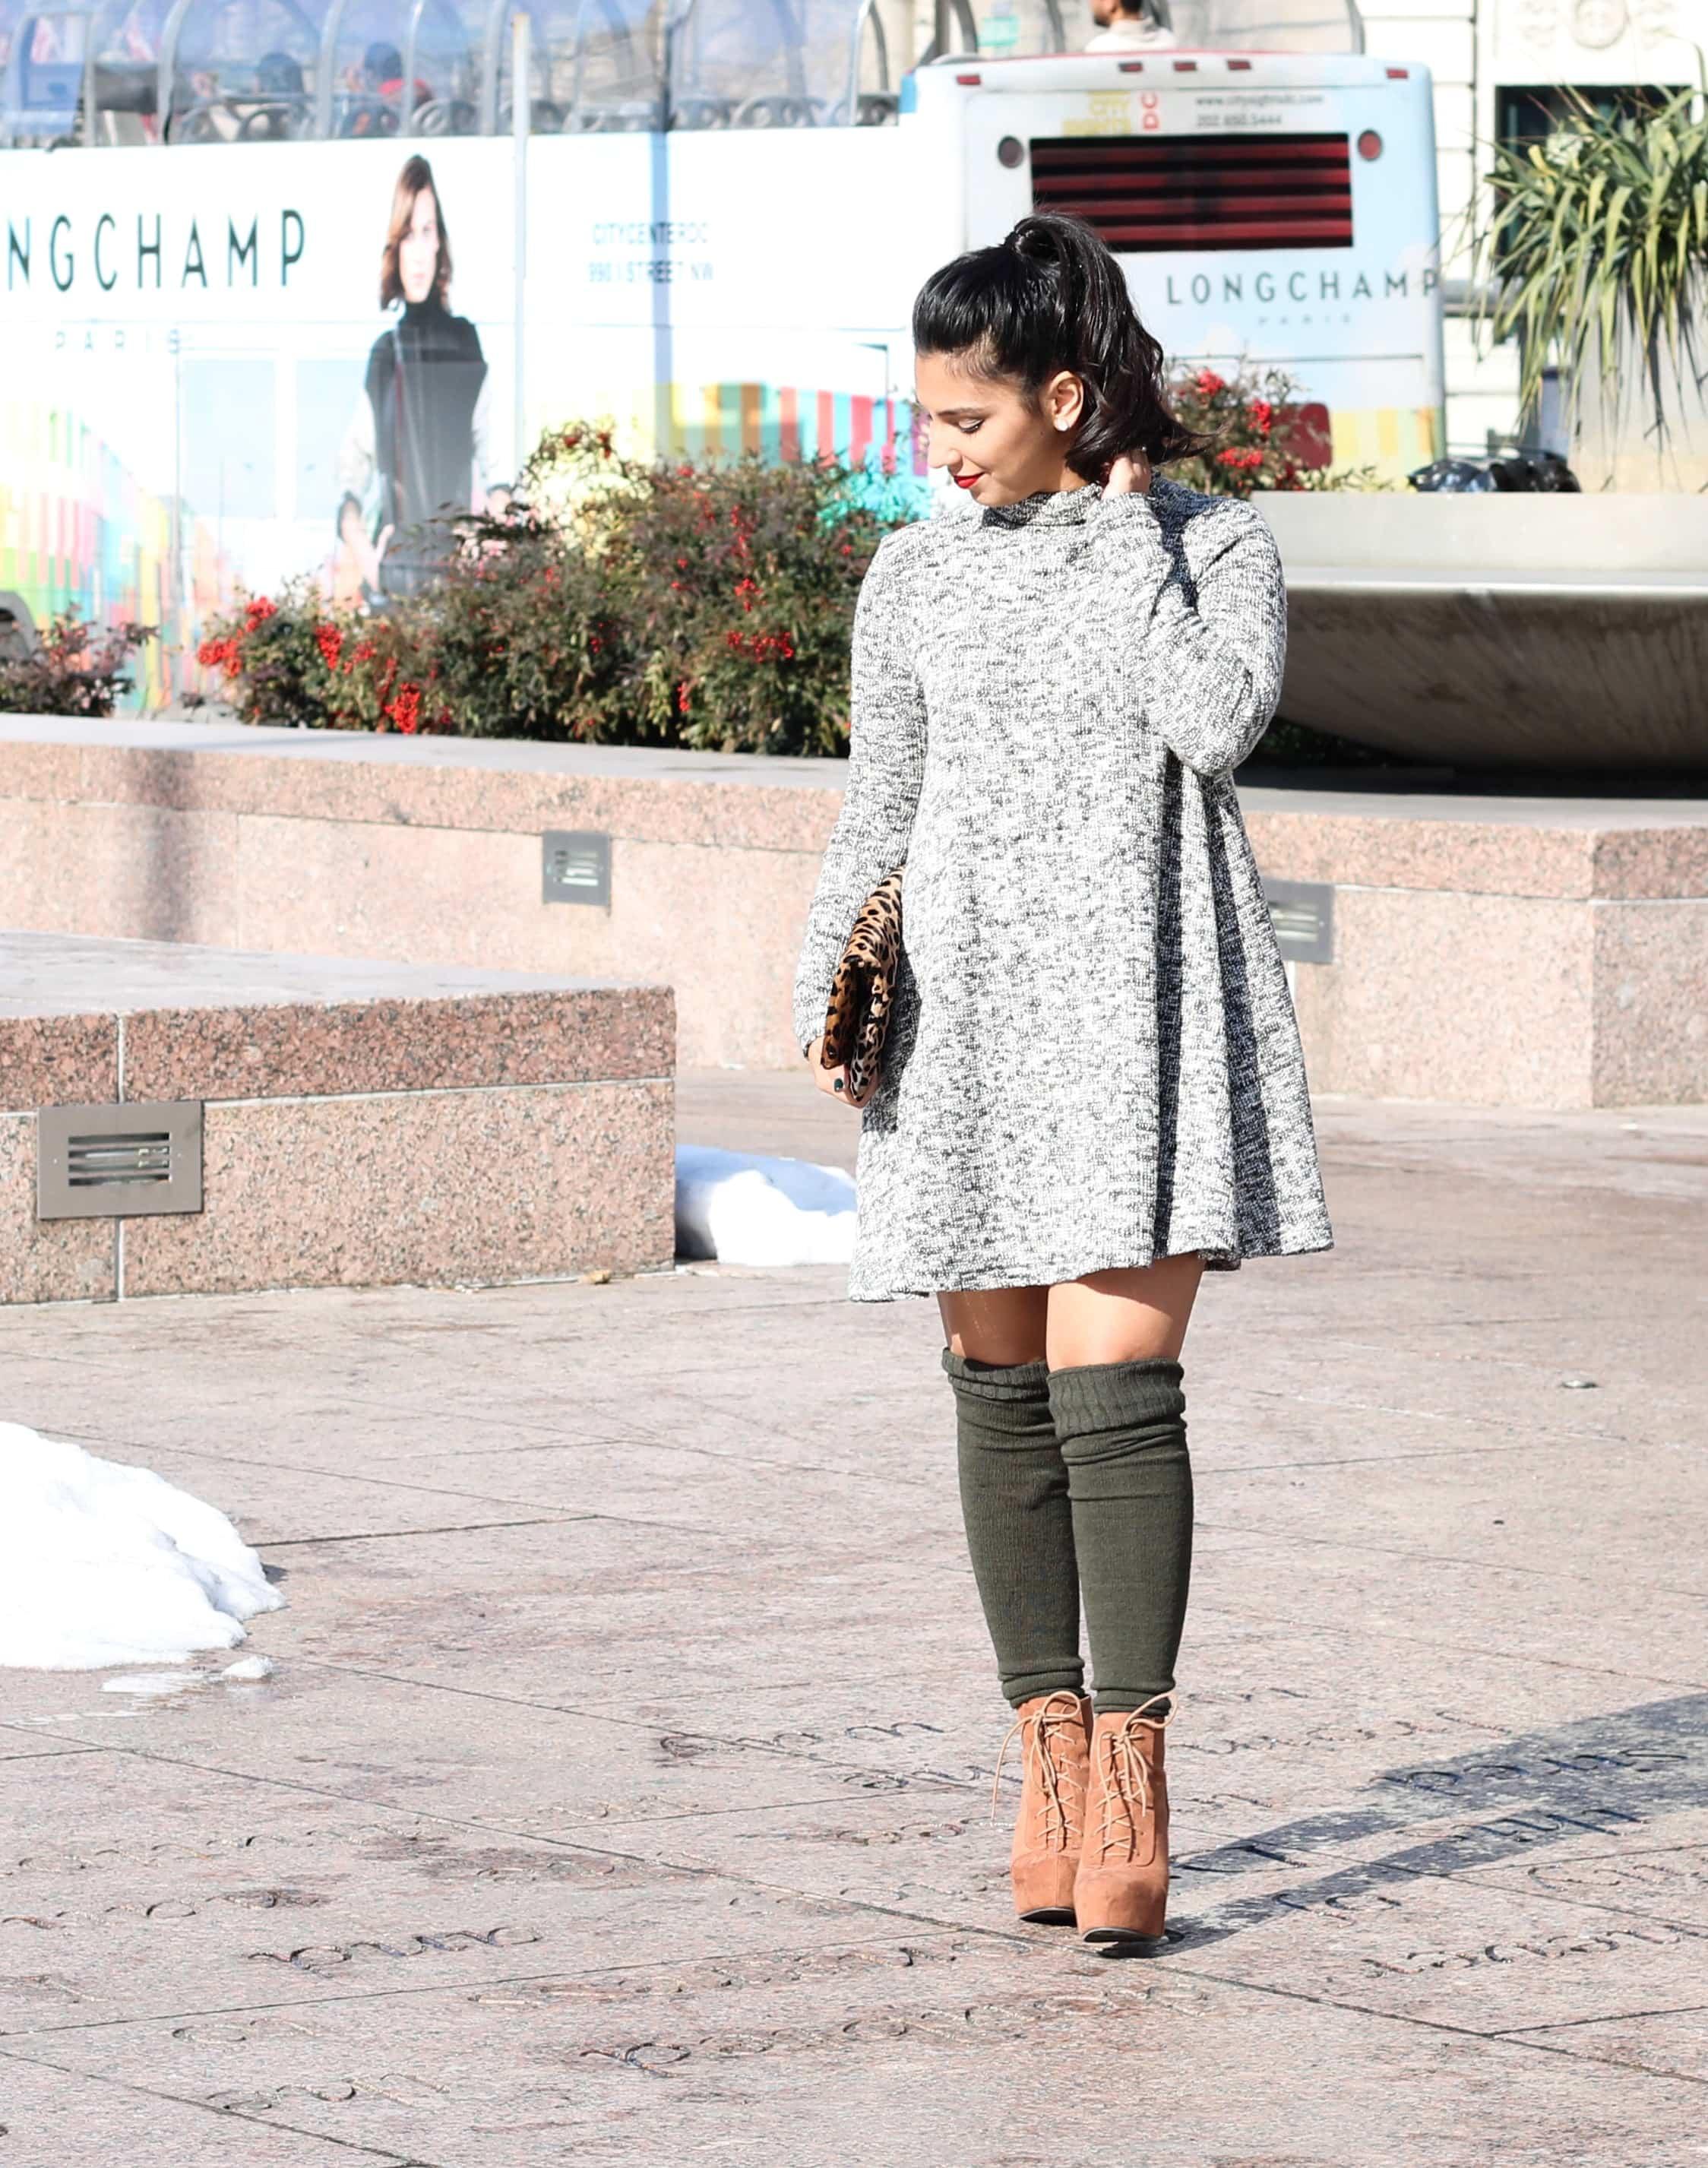 leopard clutch, clare v clutch, marled grey sweater dress, what to wear in dc, winter travel, winter fashion, otk socks, high socks, winter boots, beso stila lipstain